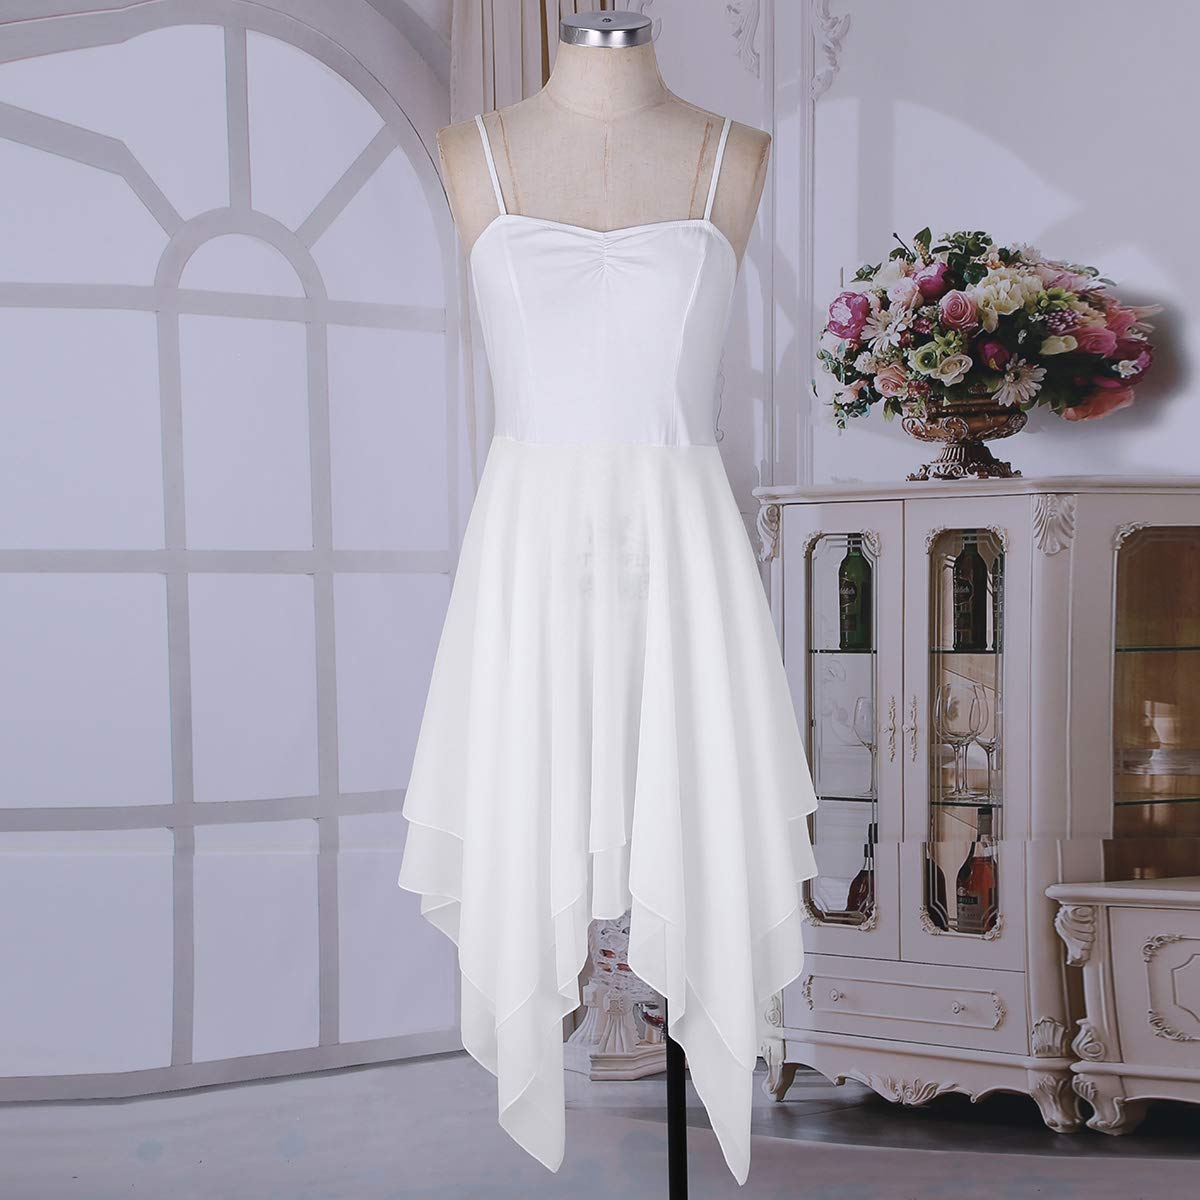 9e00461a229bb CHICTRY Robe Danse Latine Femme Robe Danseuse Robe Danse de Salon Rumba  Zumba Salsa Robe de ...